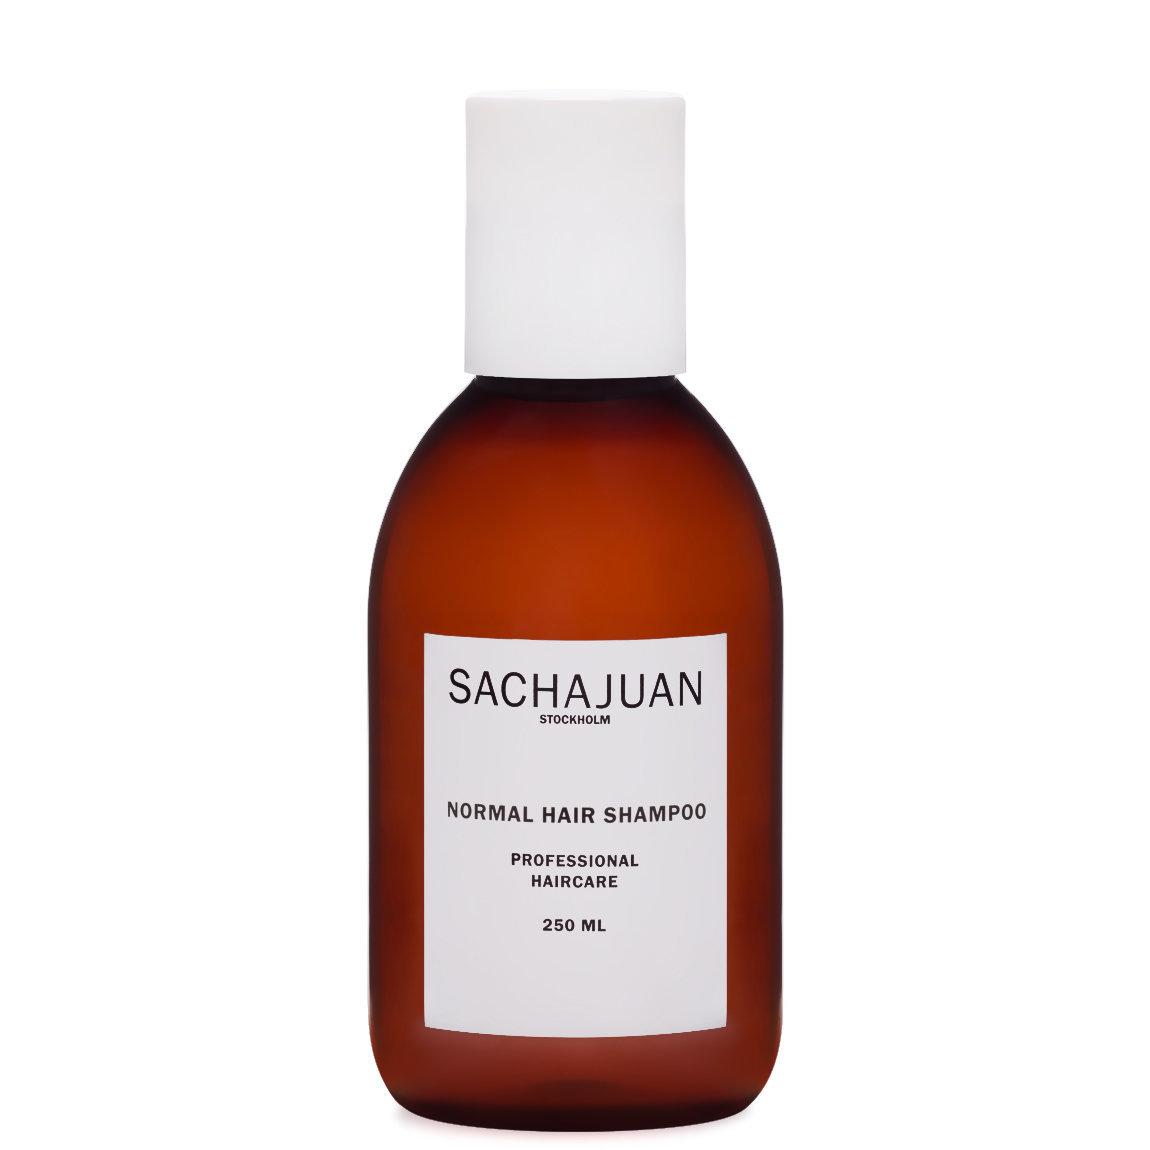 SACHAJUAN Normal Hair Shampoo product swatch.